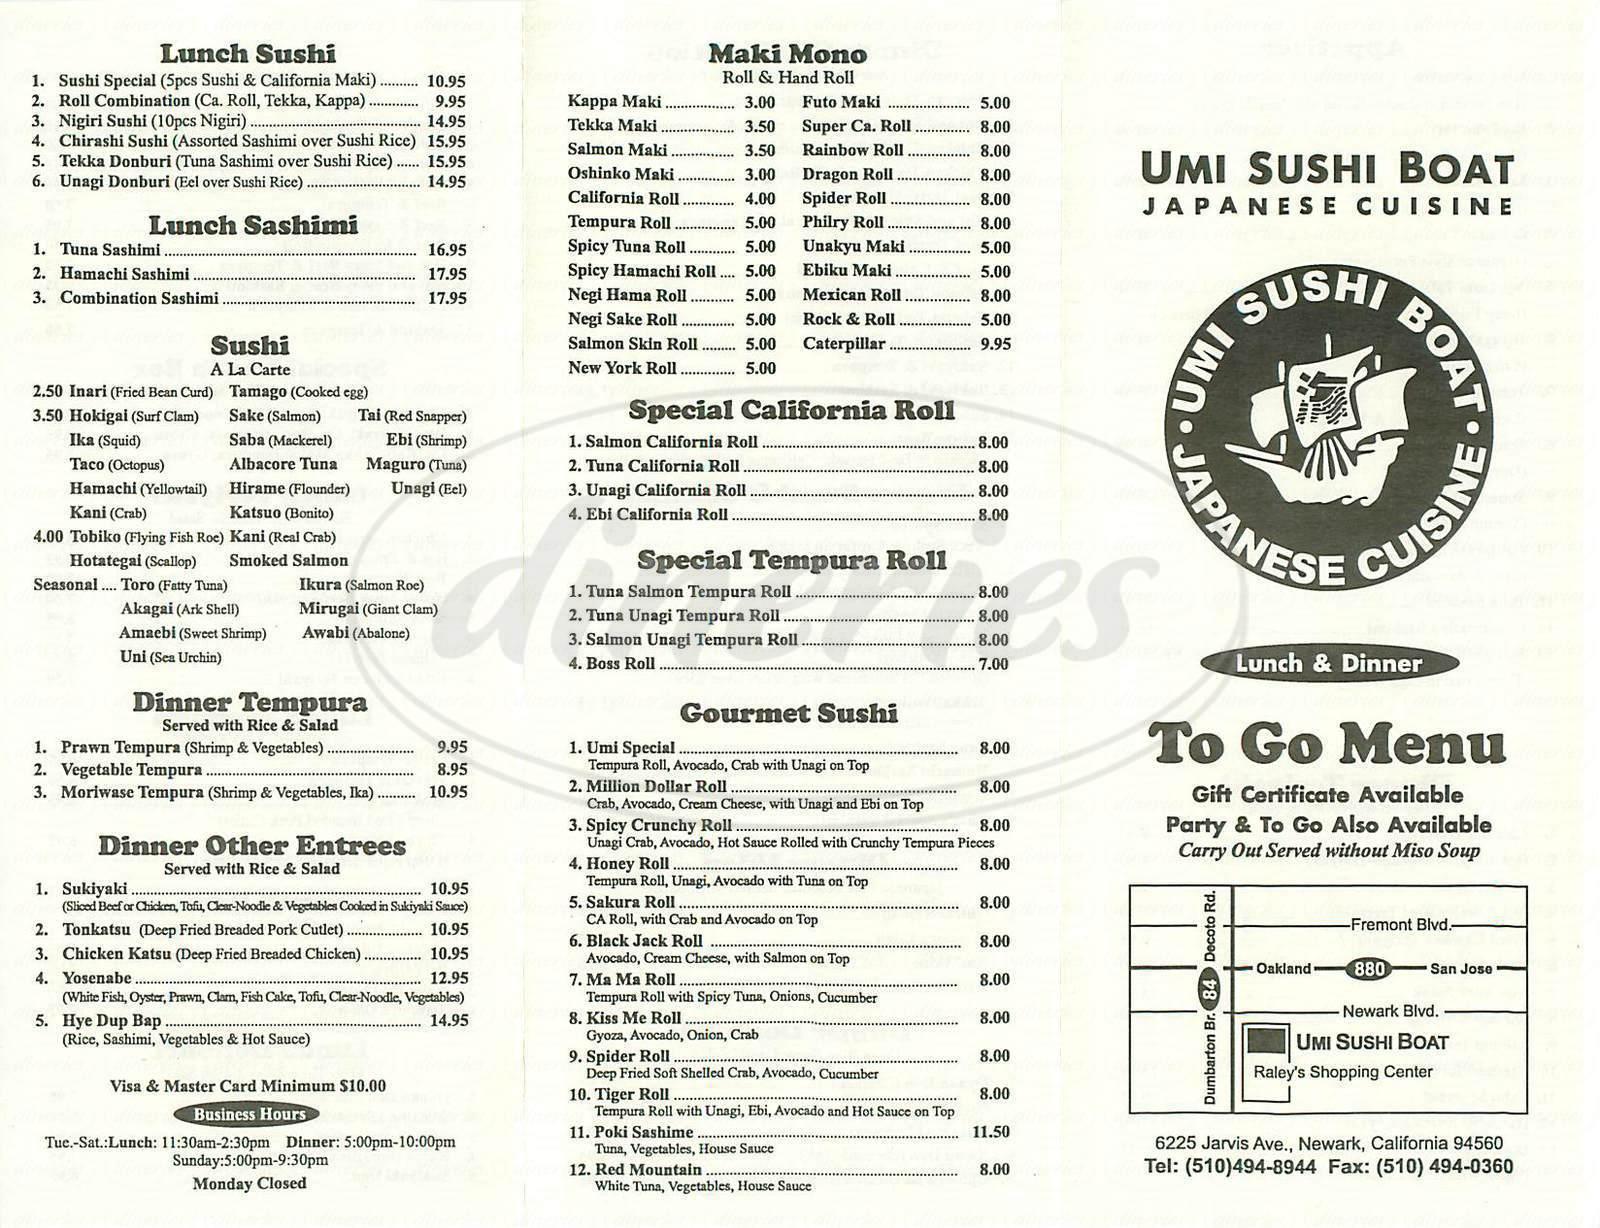 menu for Umi Sushi Boat